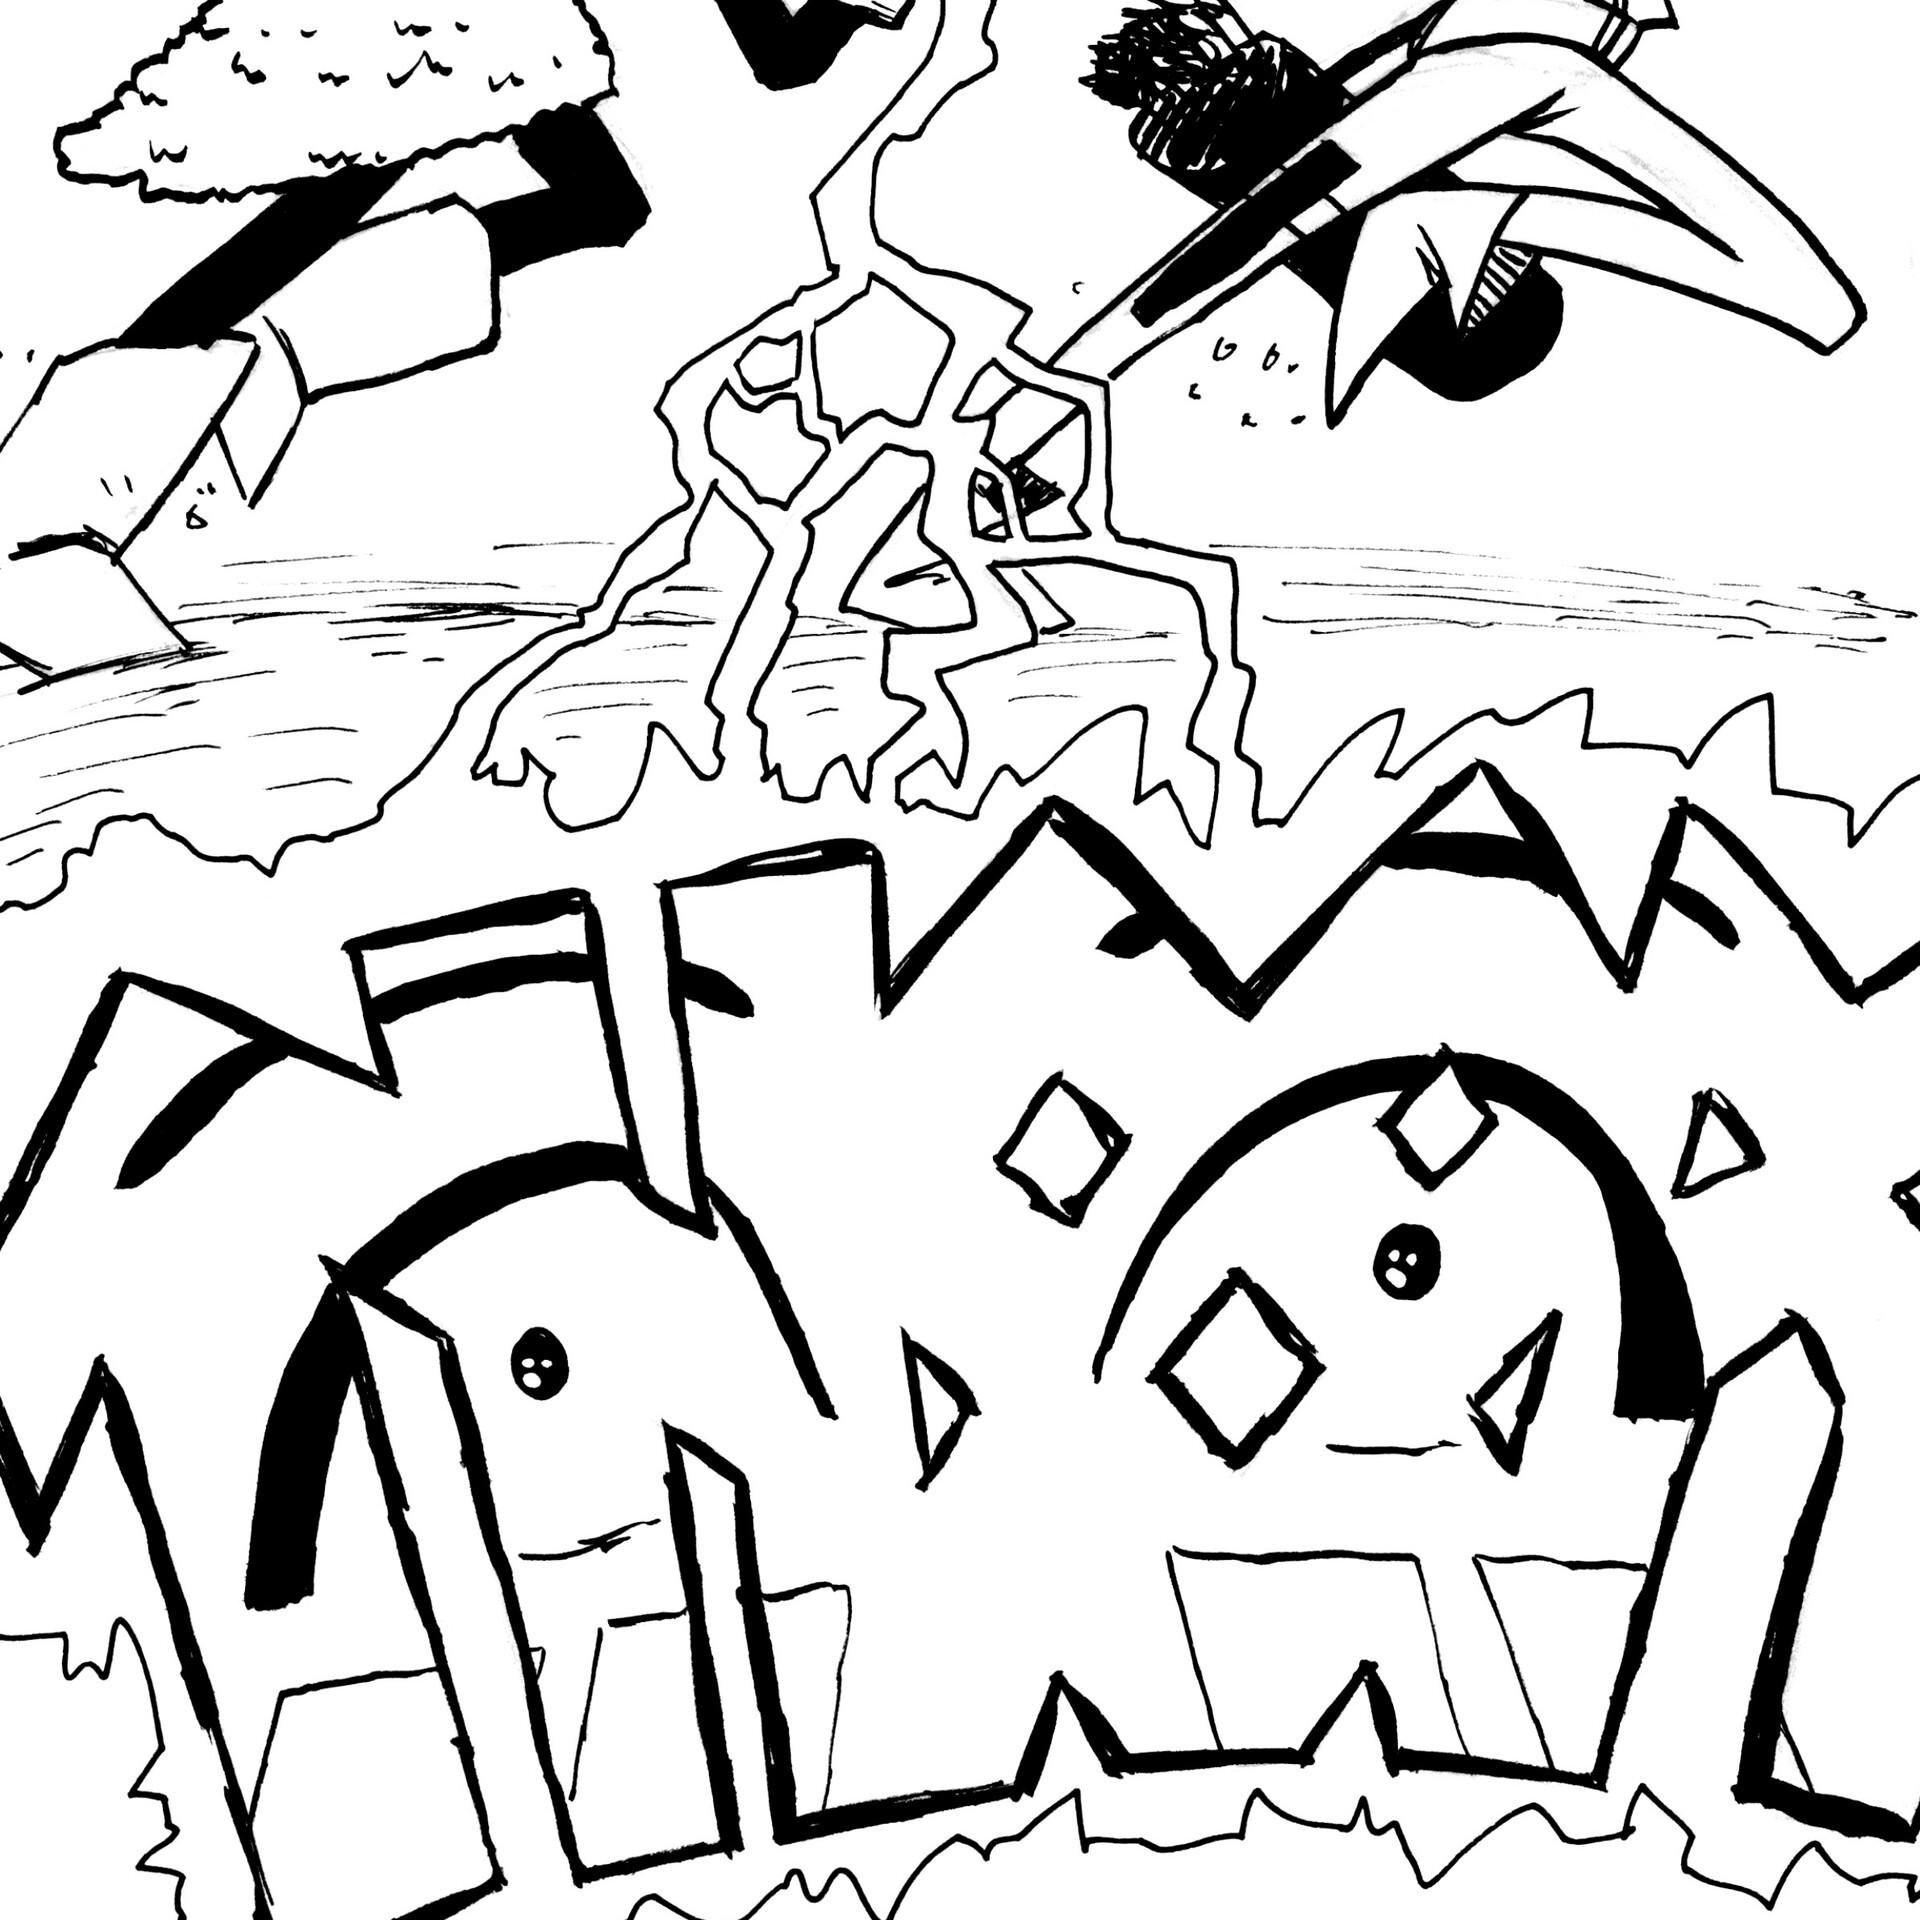 Randy haldeman rune inktober page 16